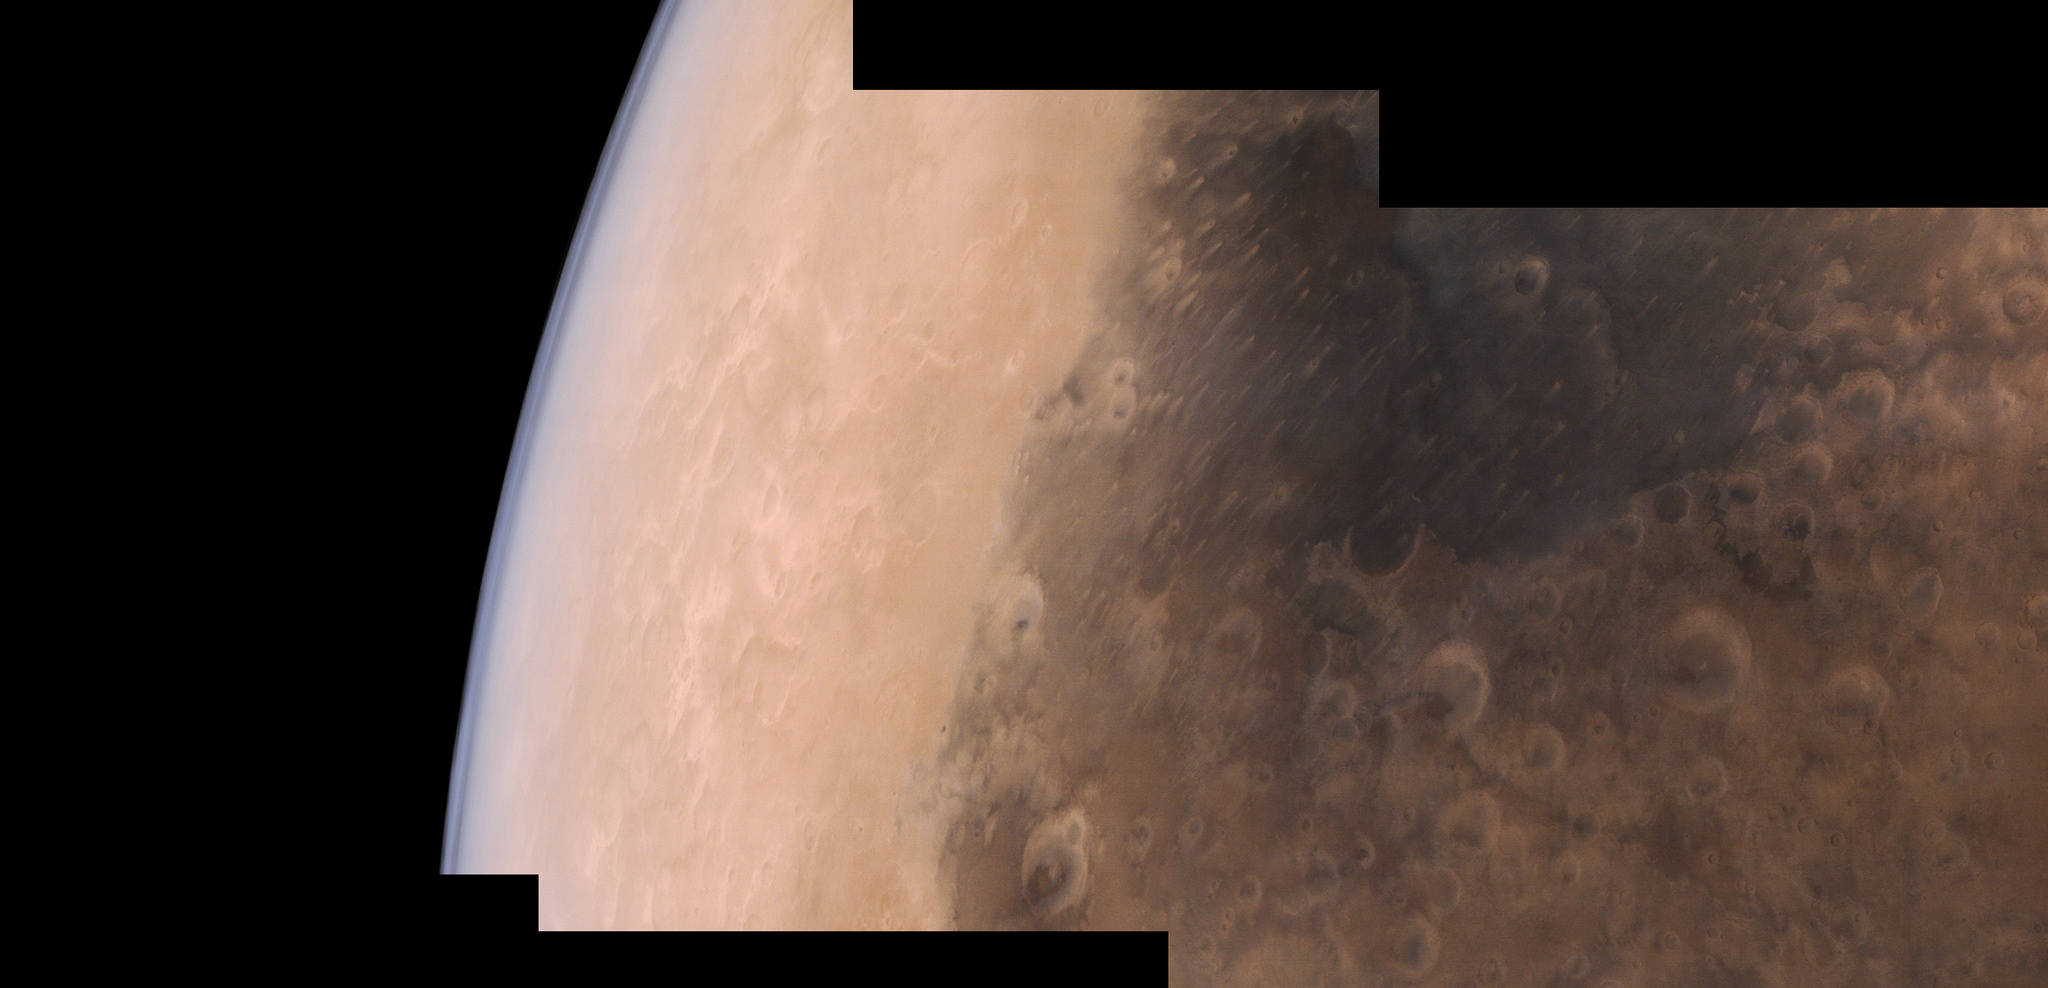 ISRO Mars Orbiter Mission's Methane Instrument Has a Glitch